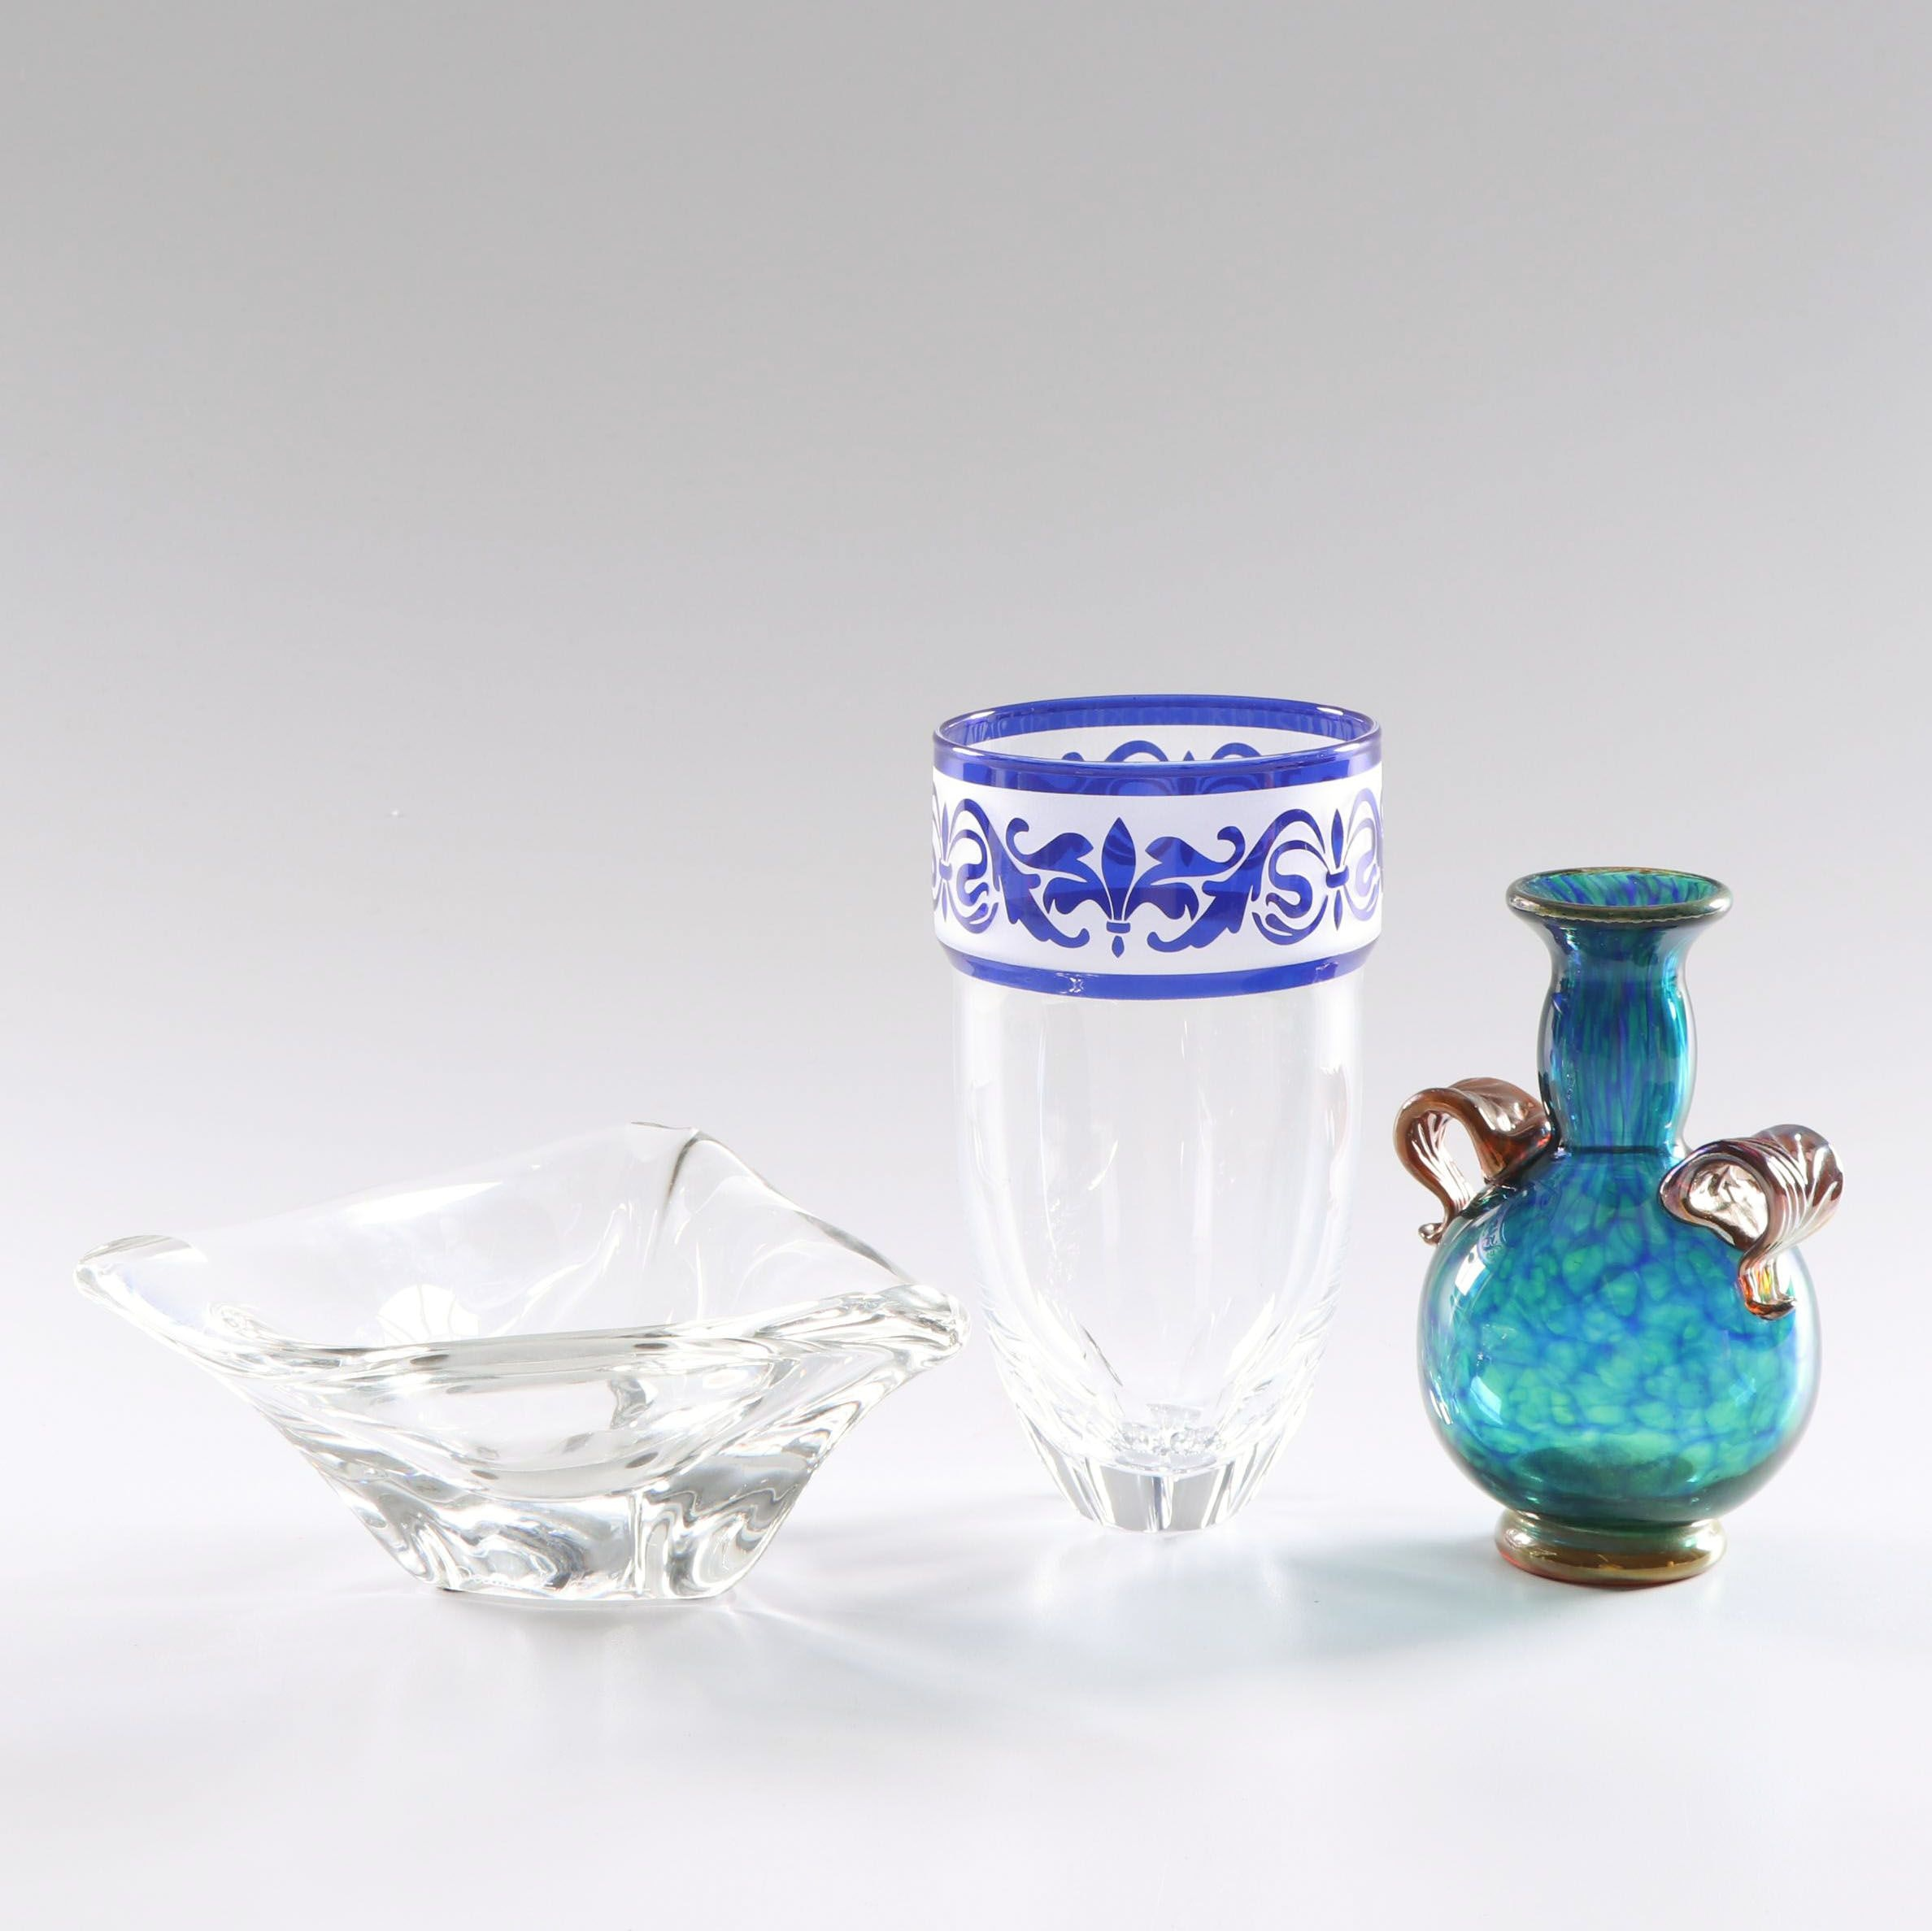 Kurt Strobach Vase, Daum Bowl, and Signed Art Glass Vase